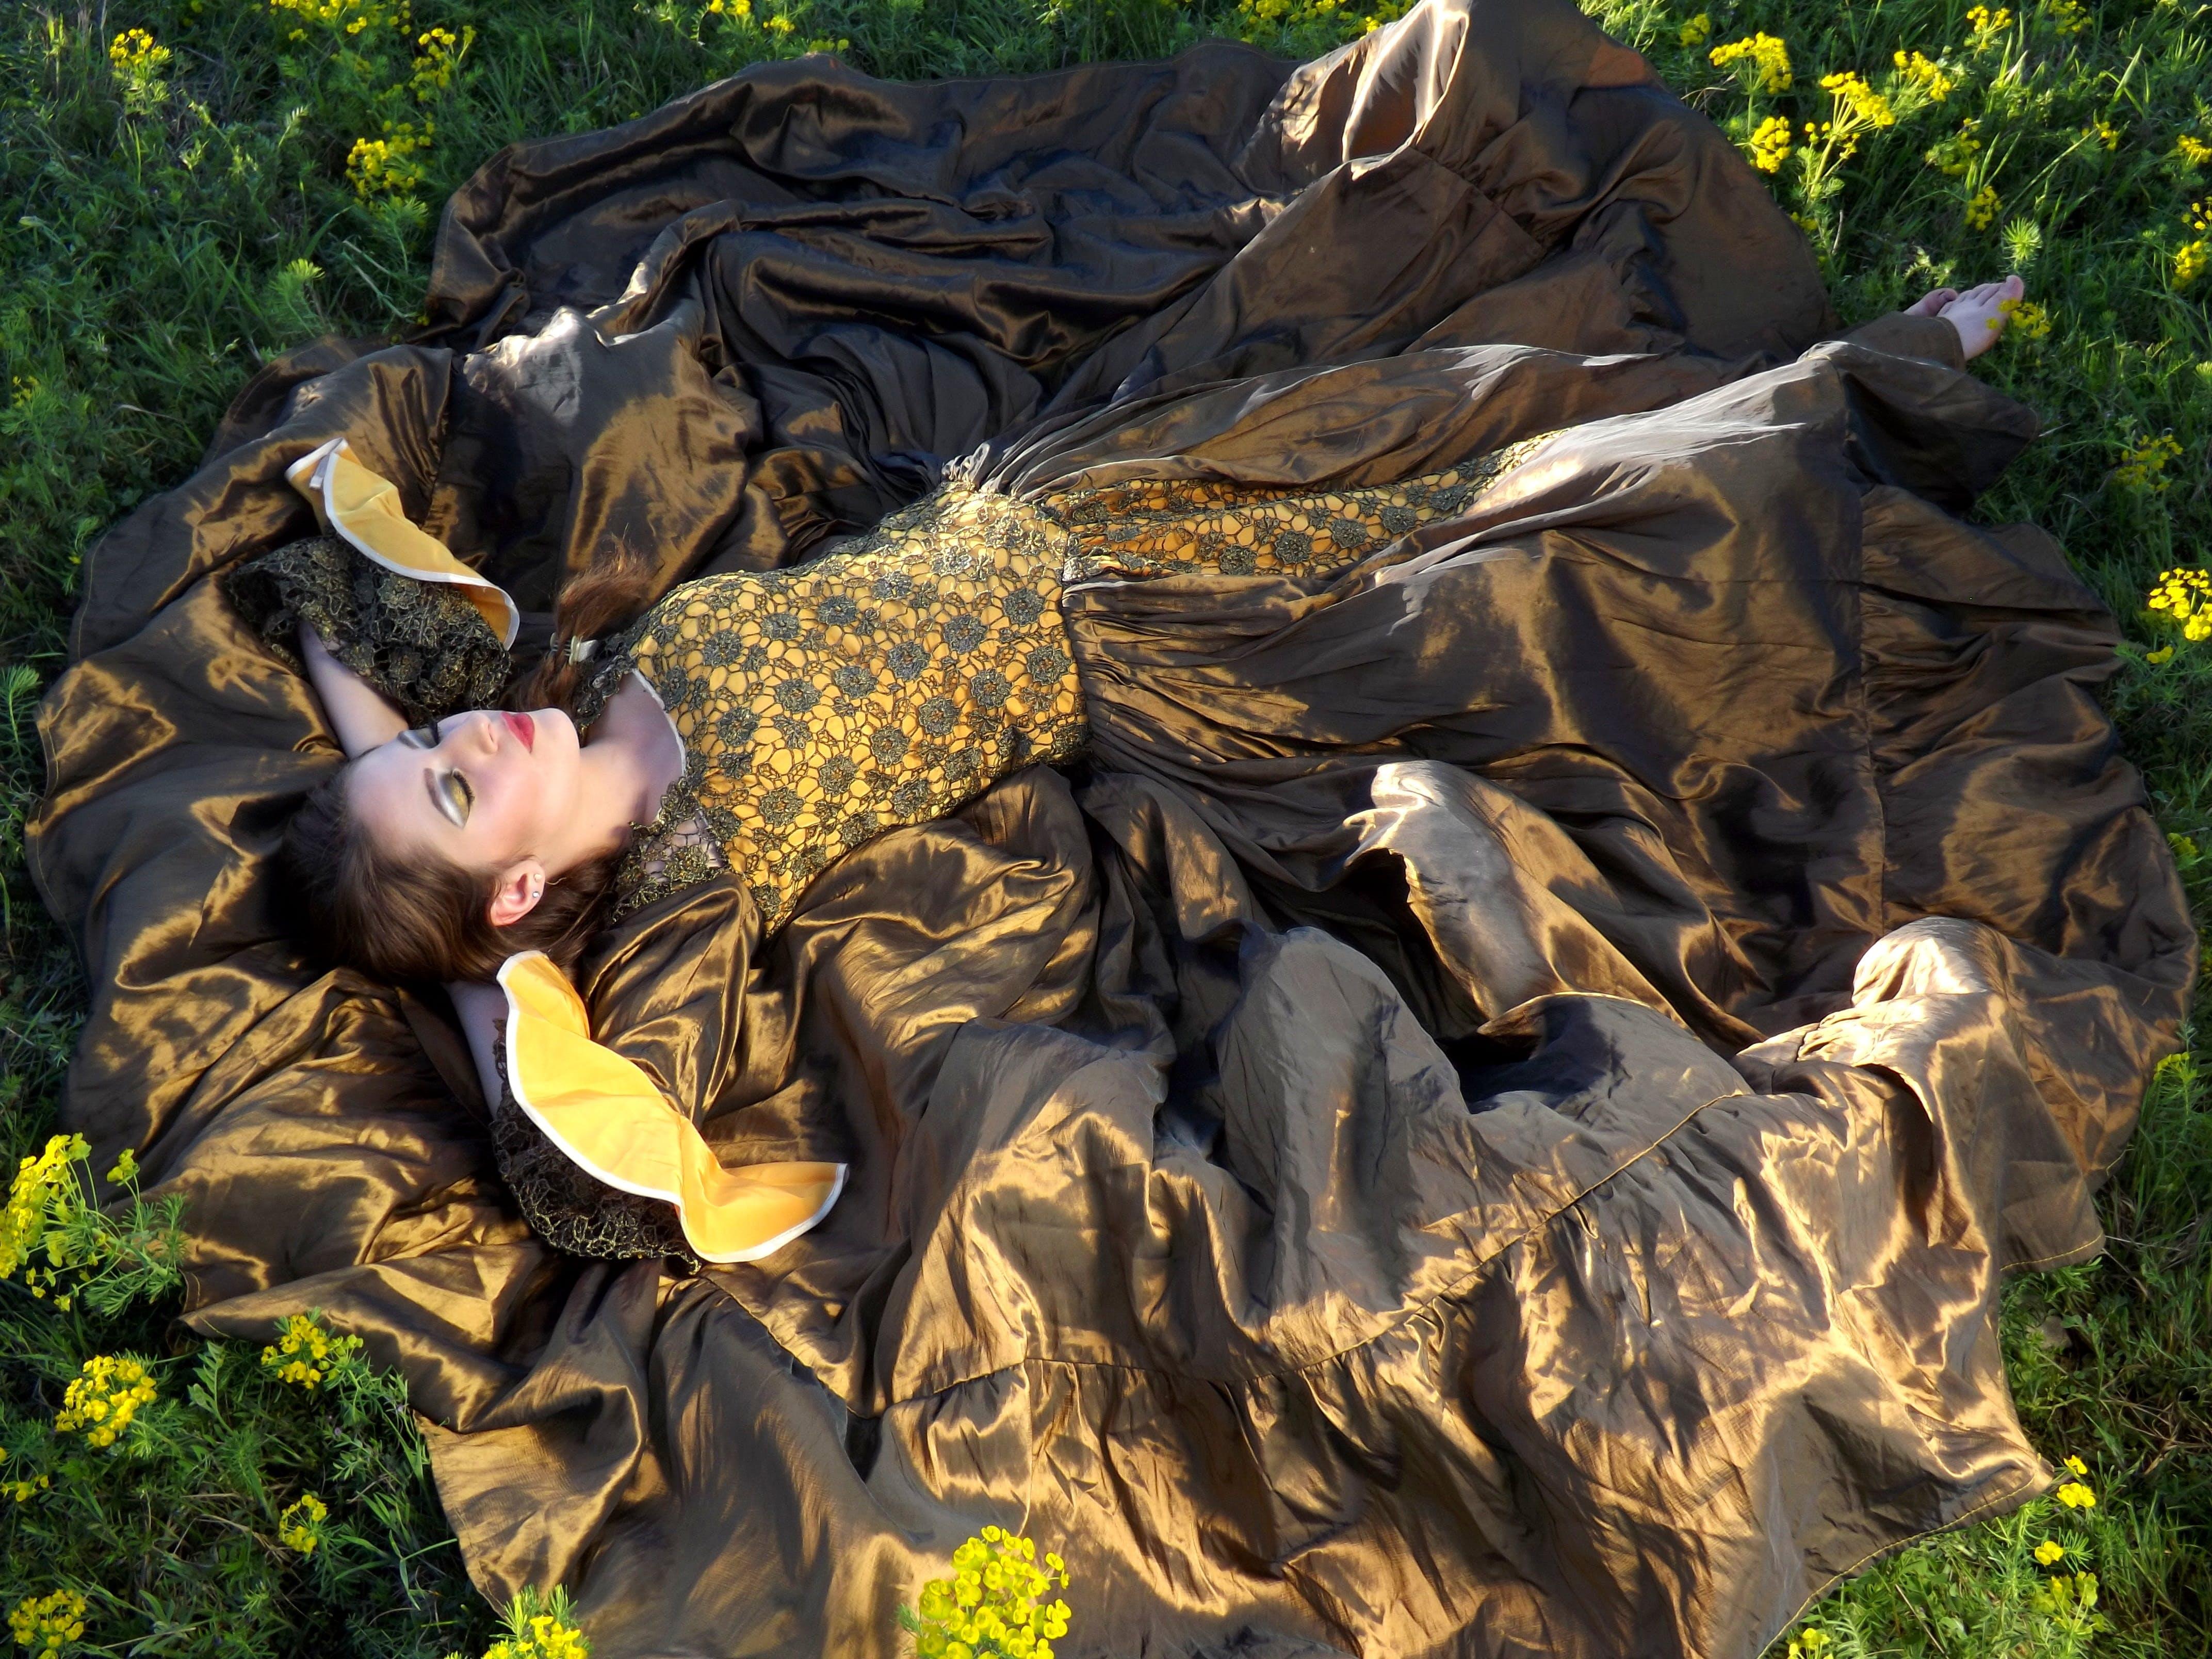 Woman Wearing Black and Yellow Dress Laying on Green Grass